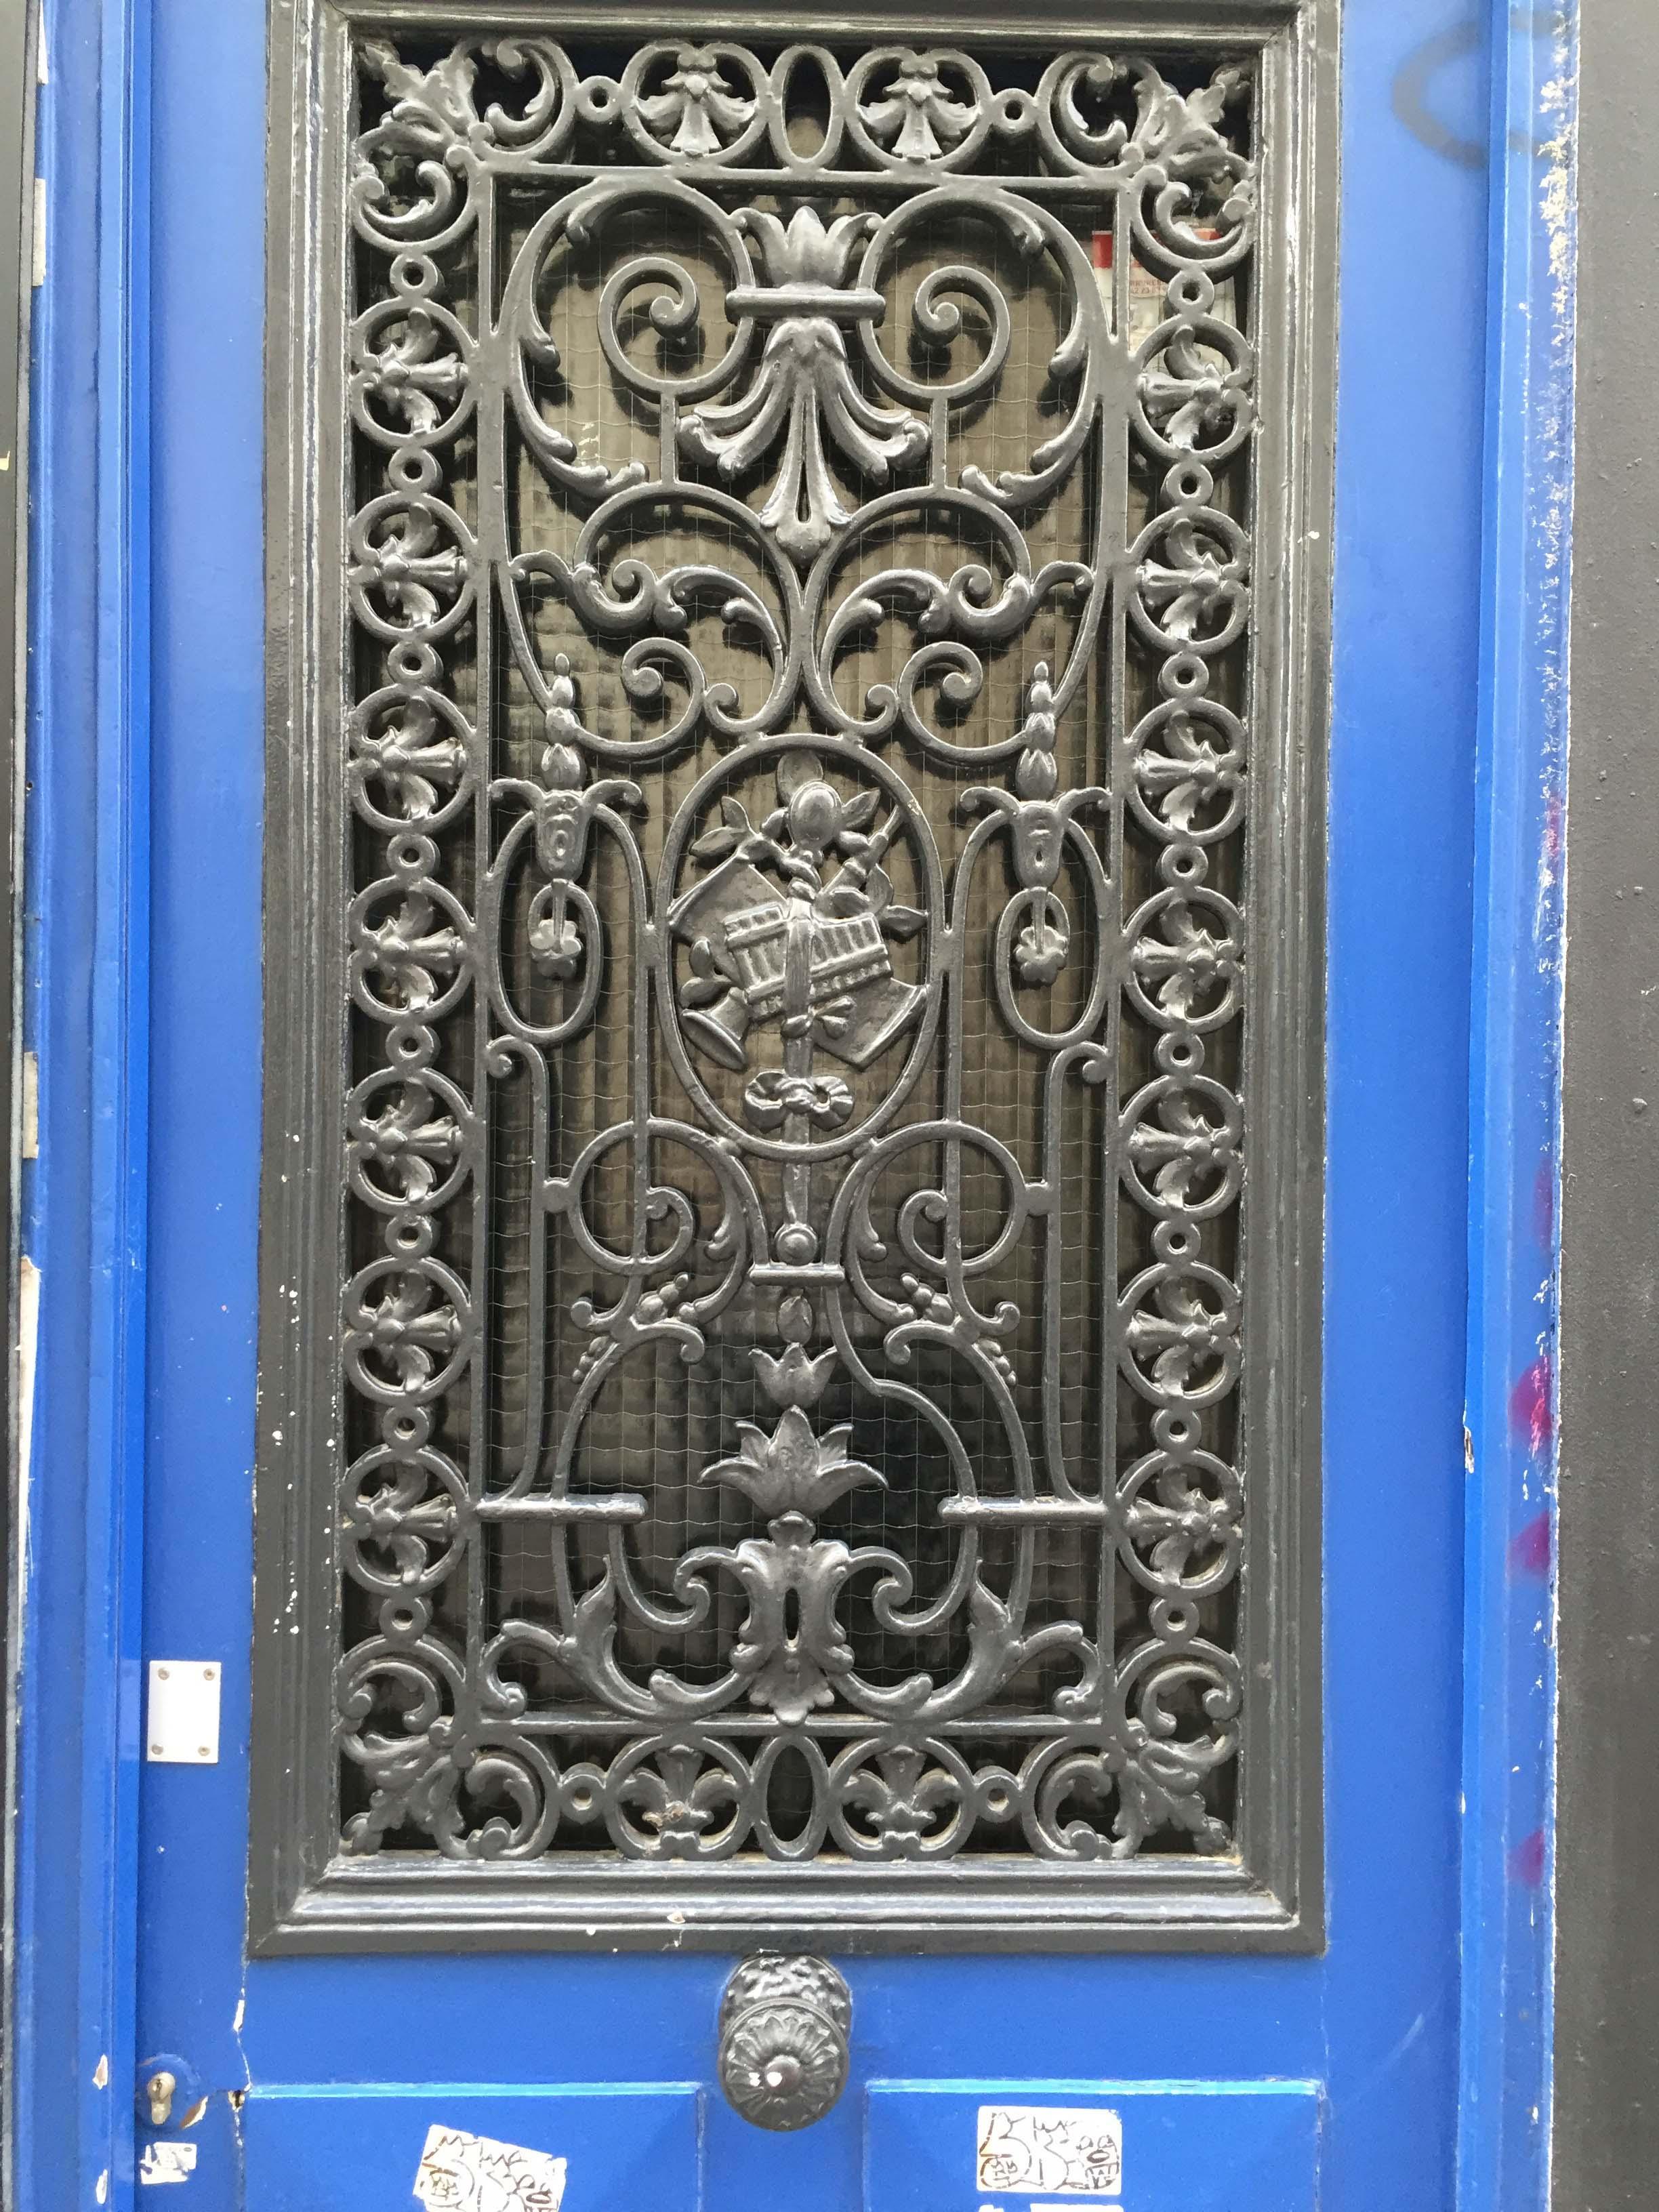 031015 – Paris – Toc Toc